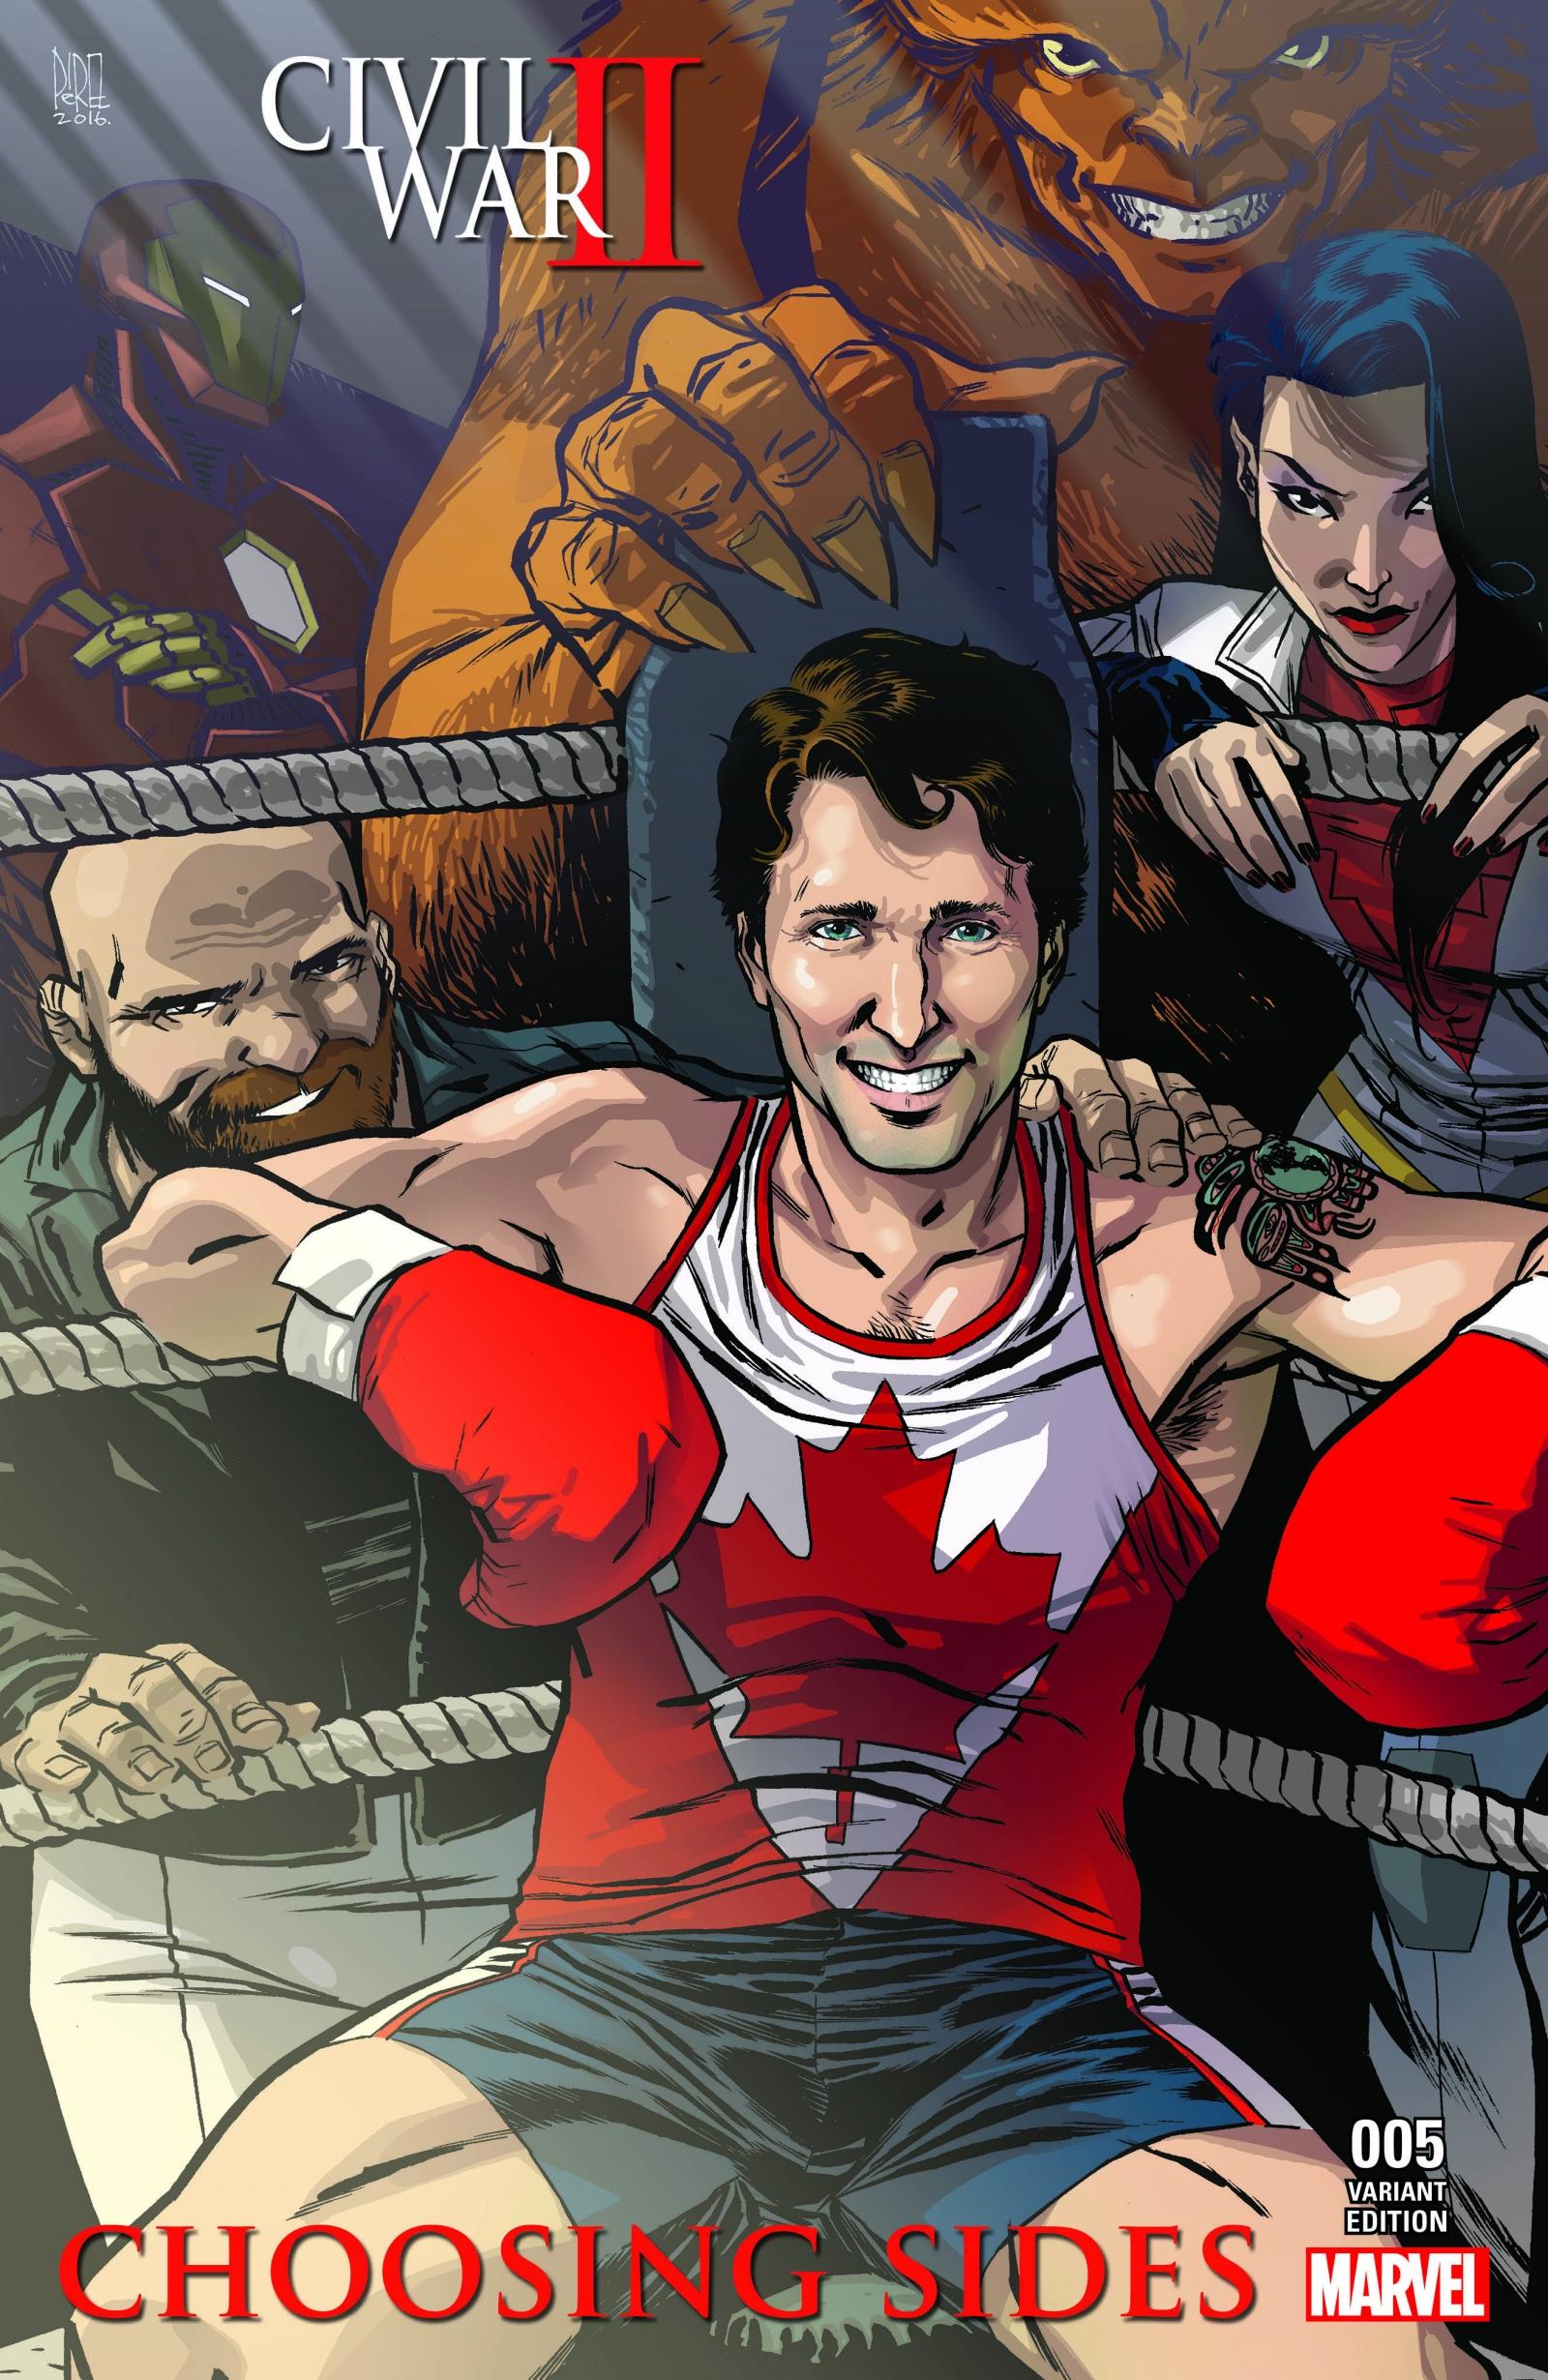 Justin Trudeau on comic book cover